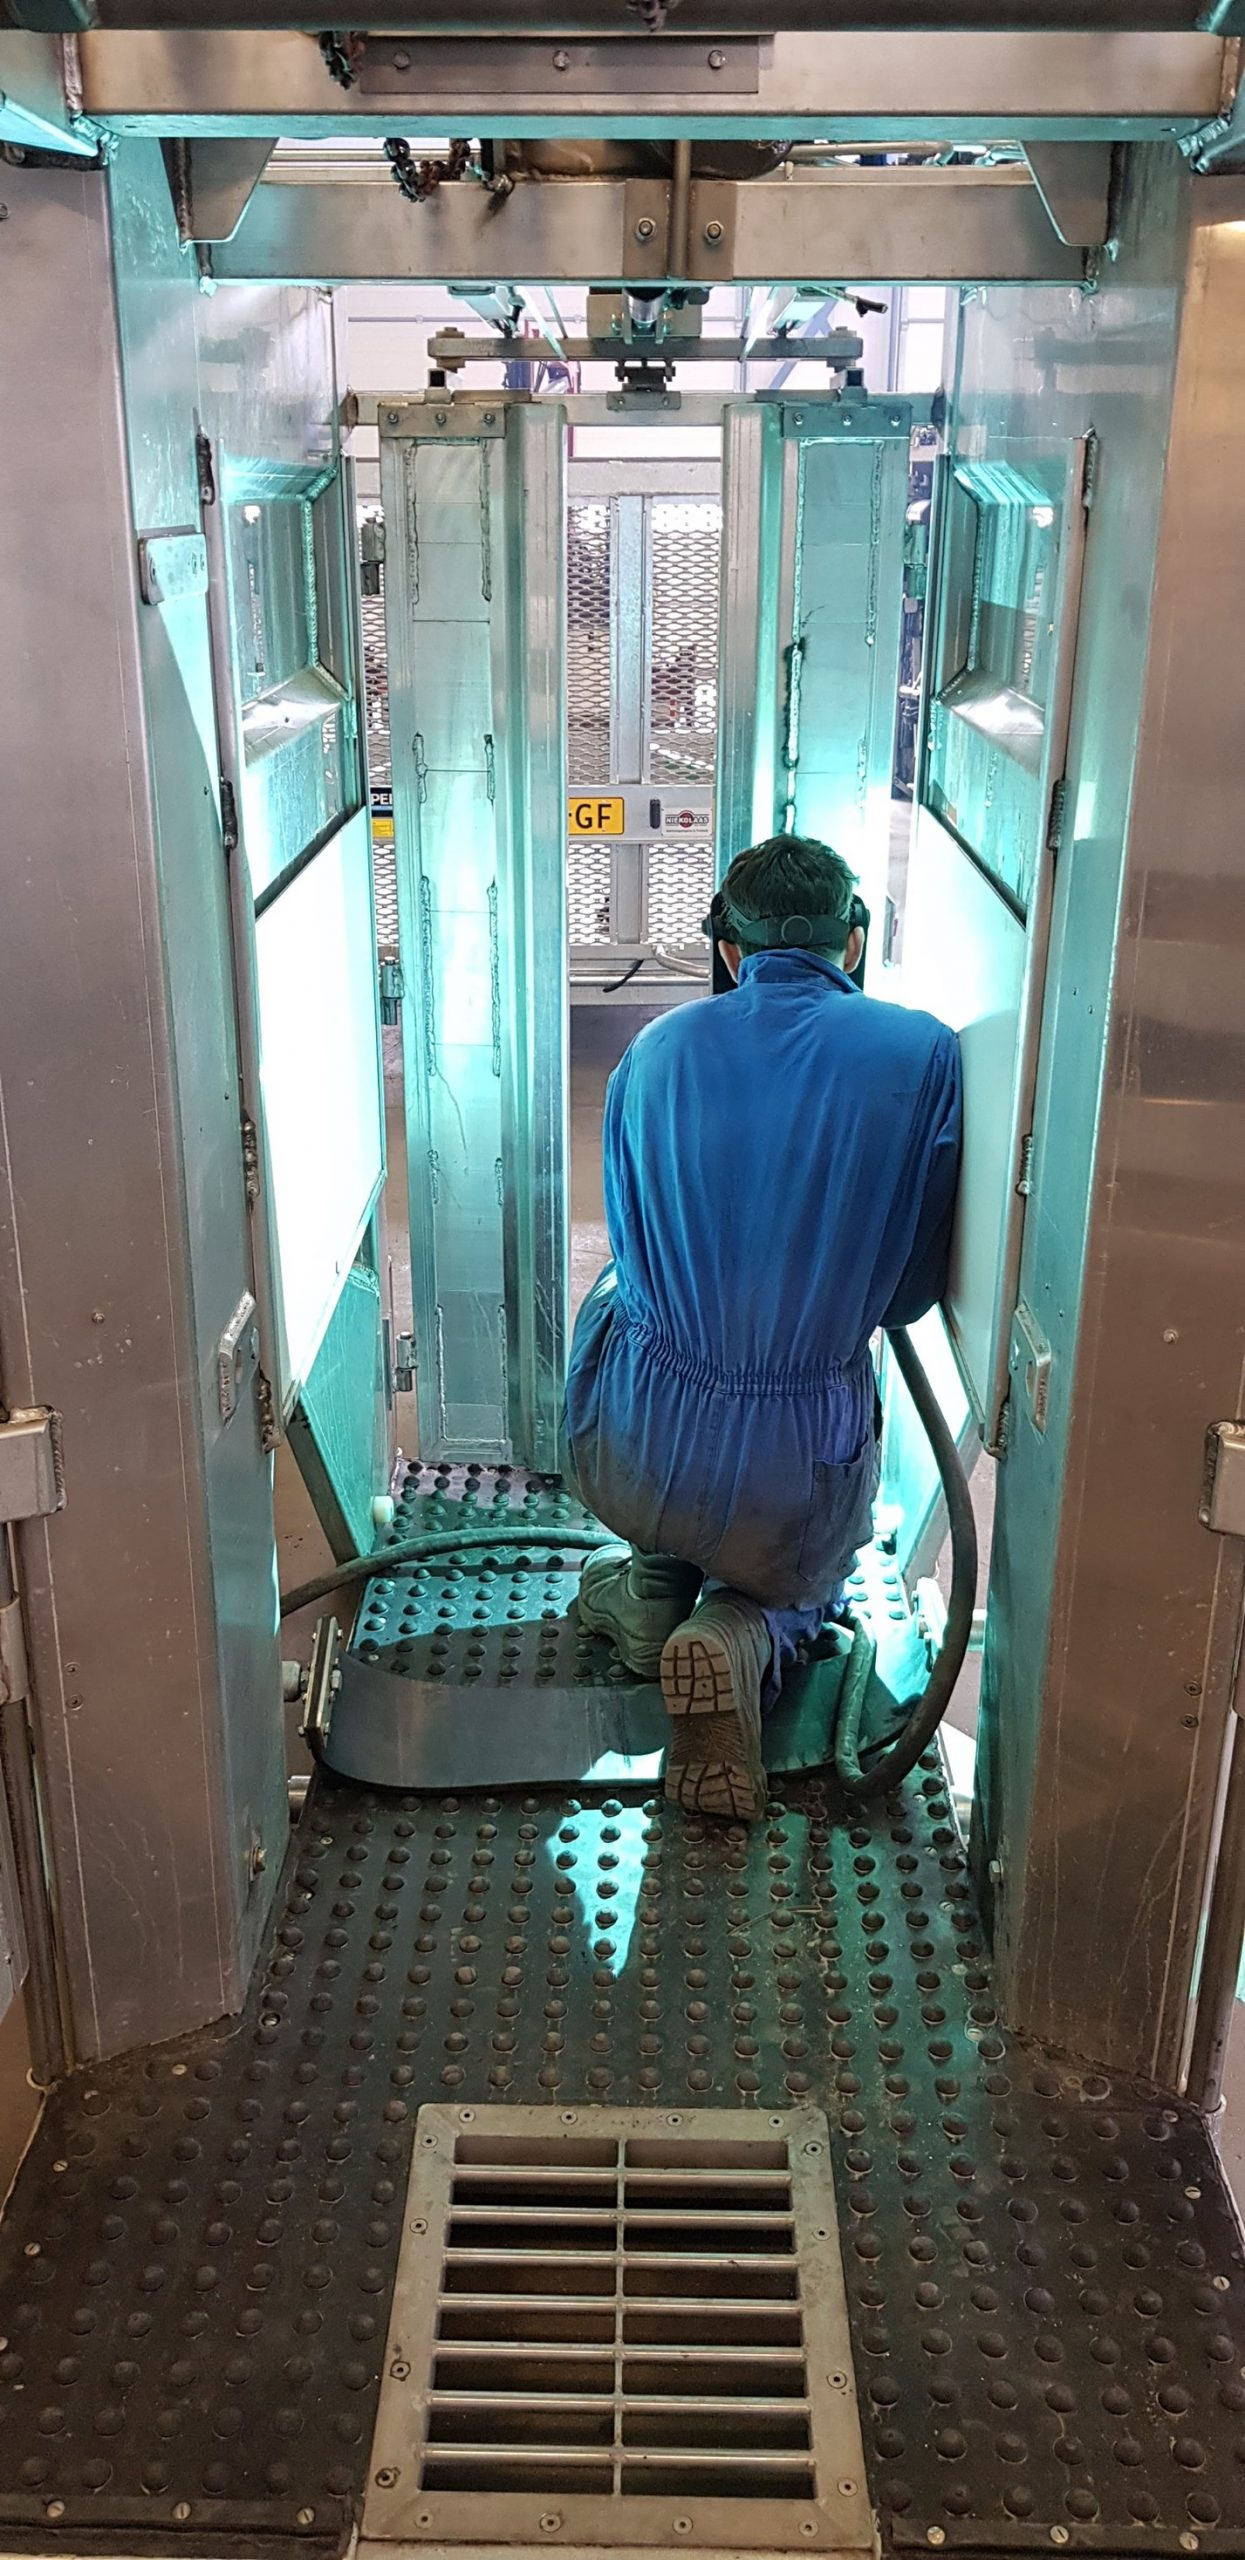 alu-Hooftrimmer-CC02-hydraulic-hoof-trimming-chute